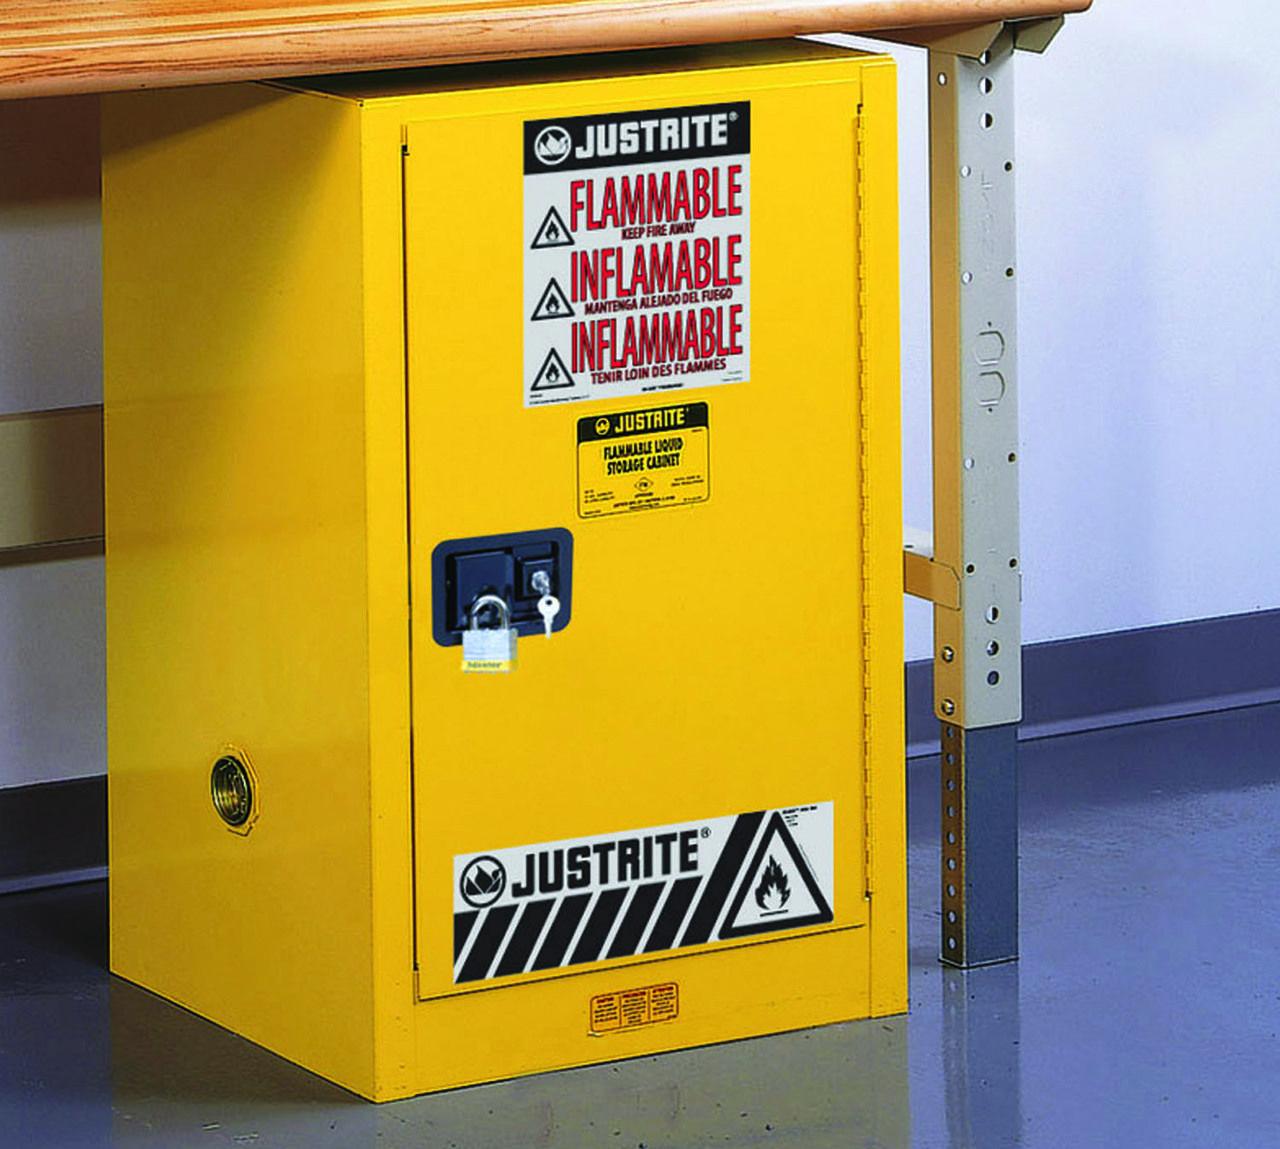 Justrite 891220 12 Gallon Safety Cabinet Compac Sure Grip Ex Self Close Storage Utility Storage Cabinet Buy Cabinets